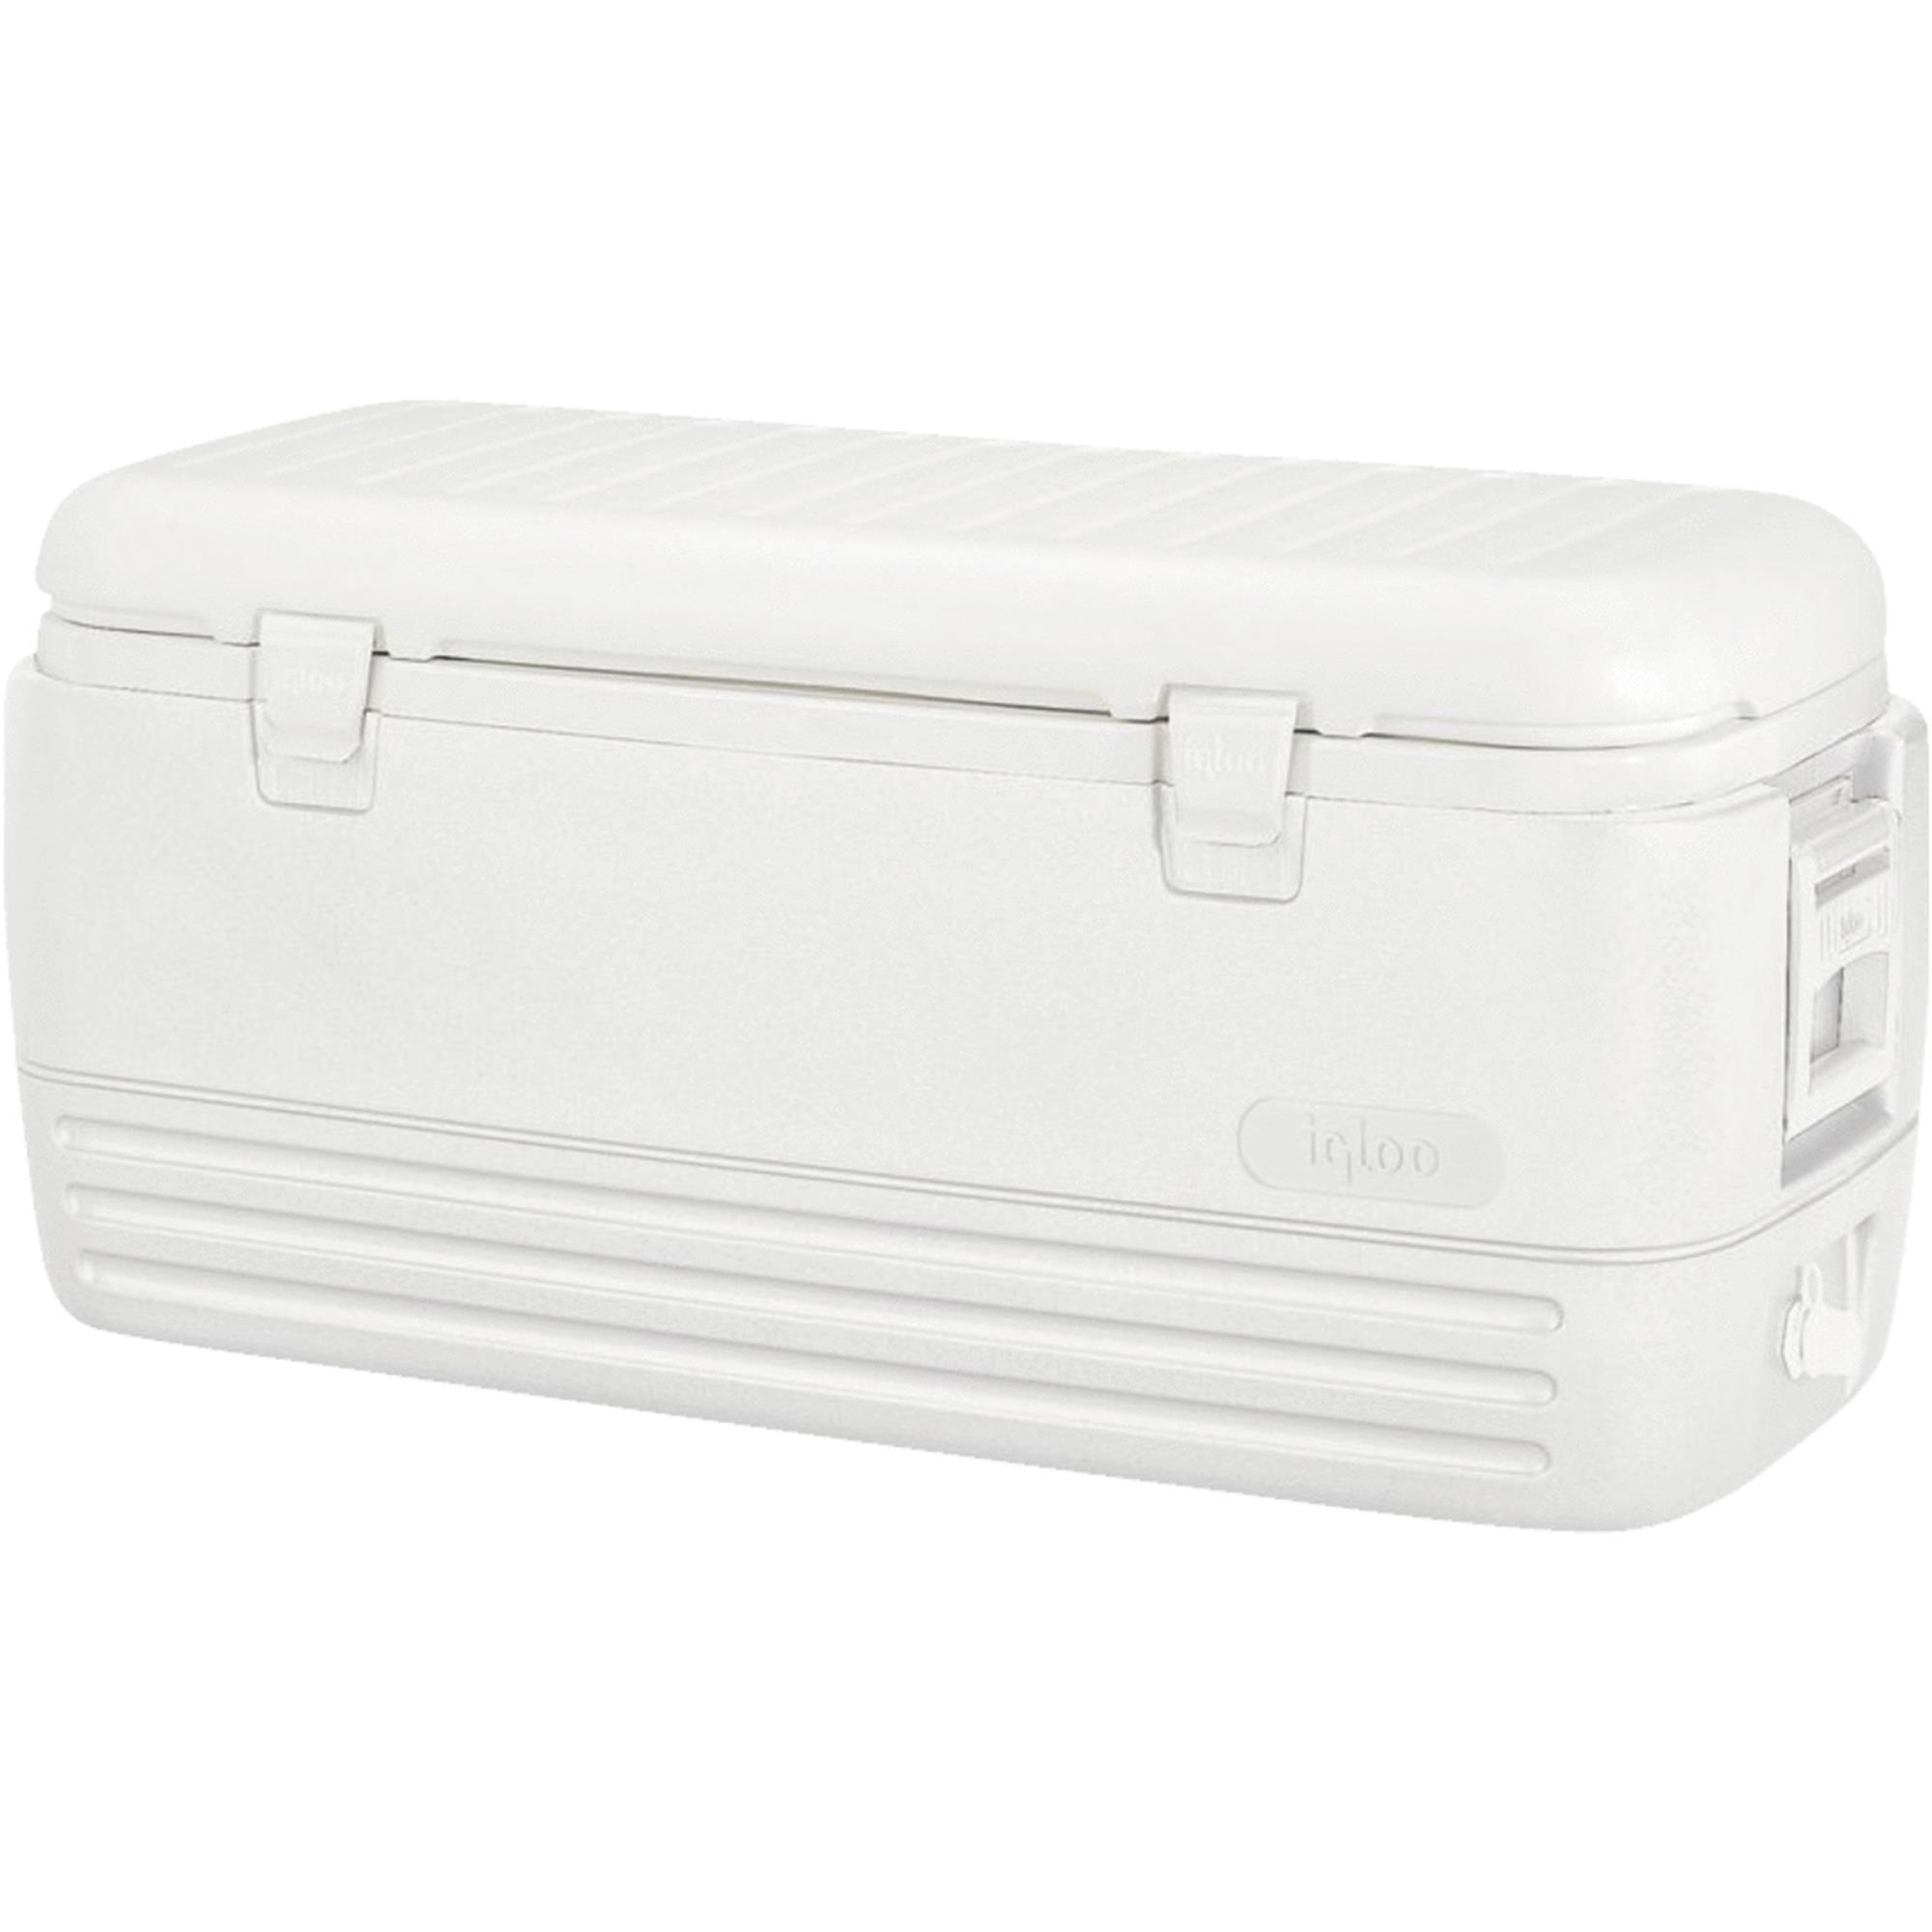 Igloo 120-Quart Polar Cooler